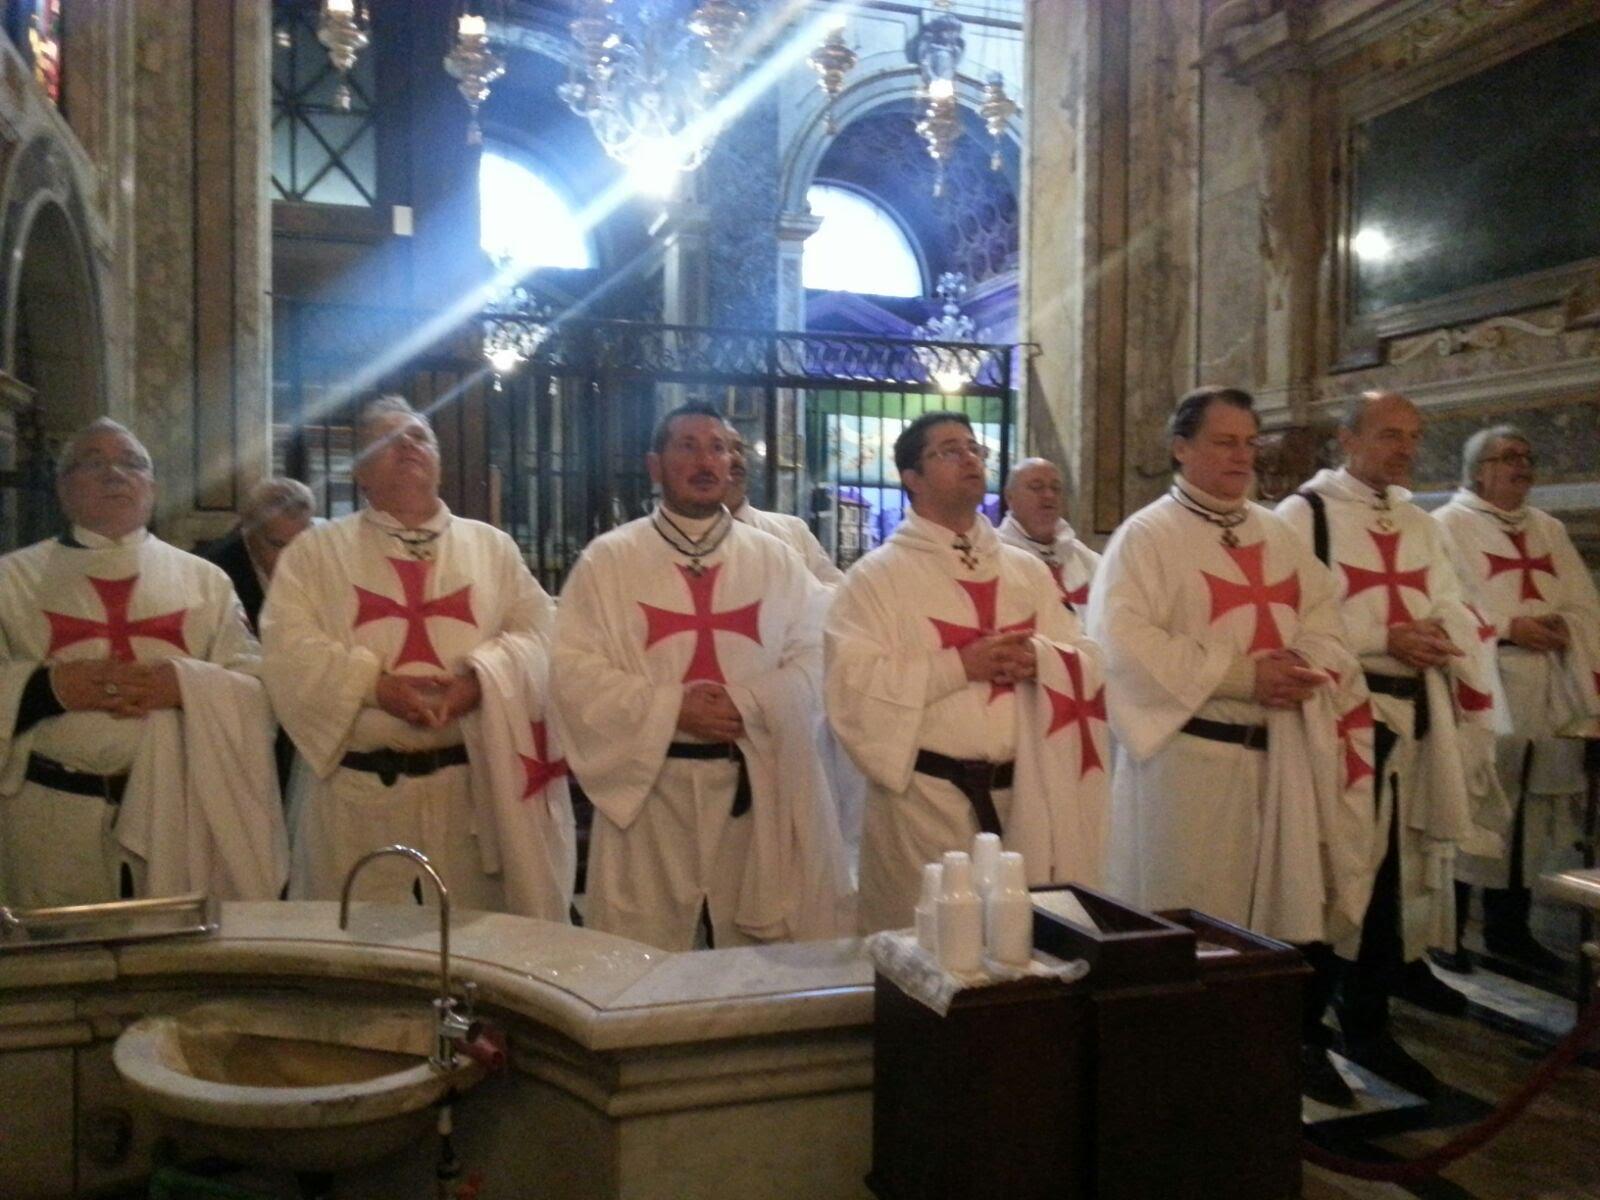 January 13-14, 2018 – Custody of four basilicas in Rome